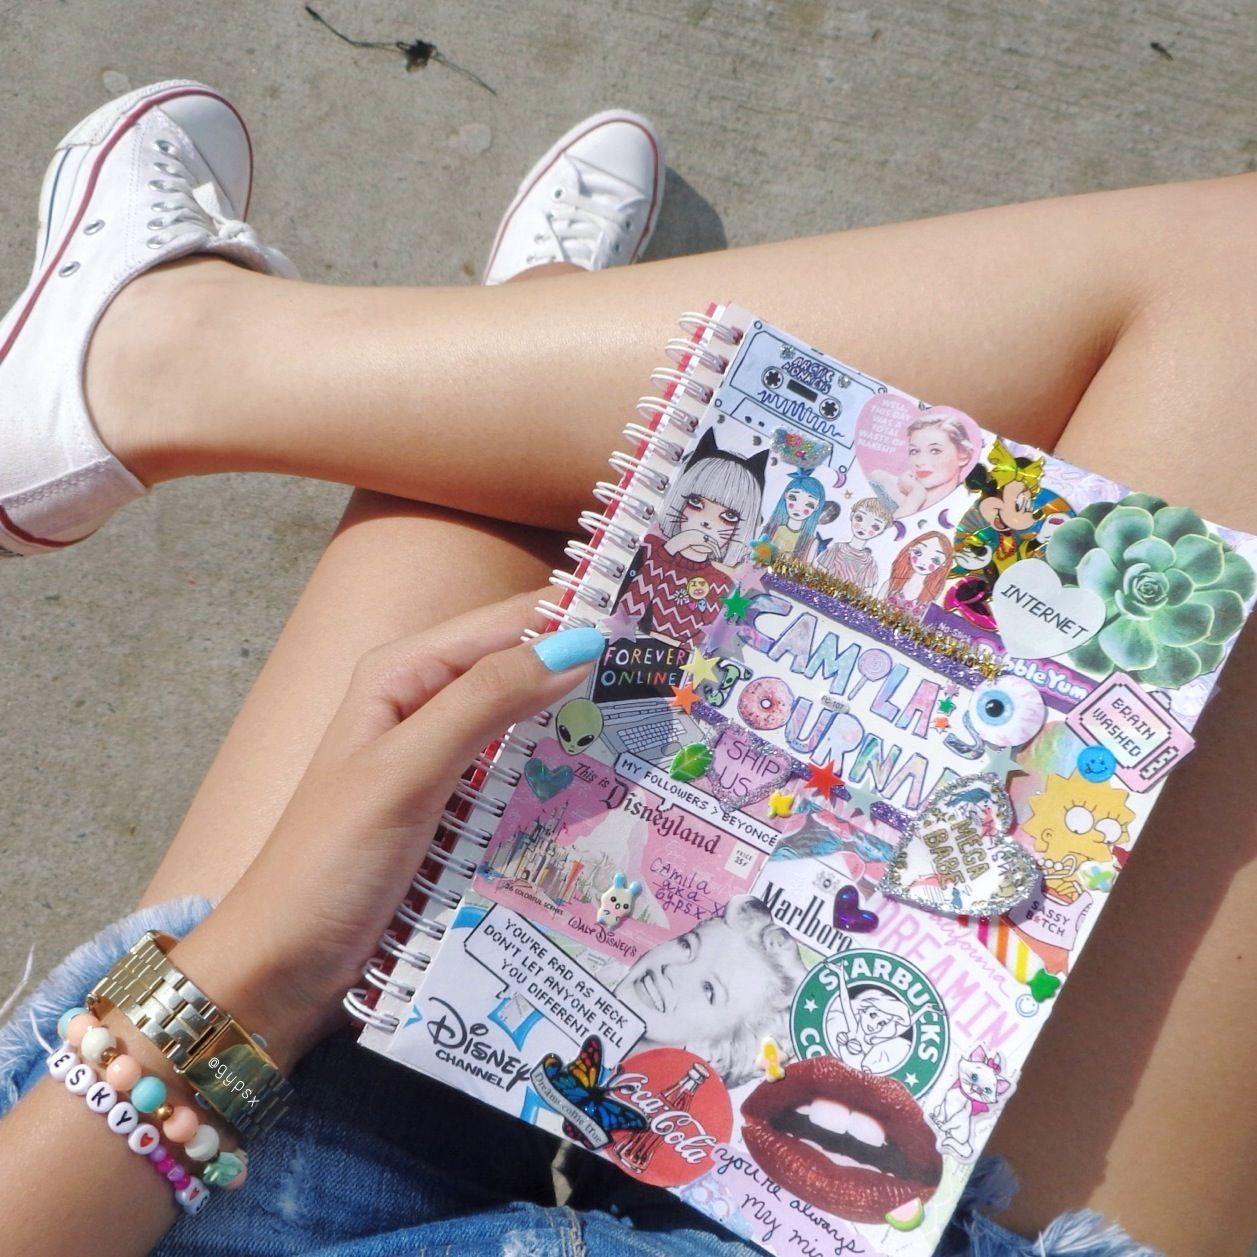 prada shoes tumblr diy notebooks covers diy